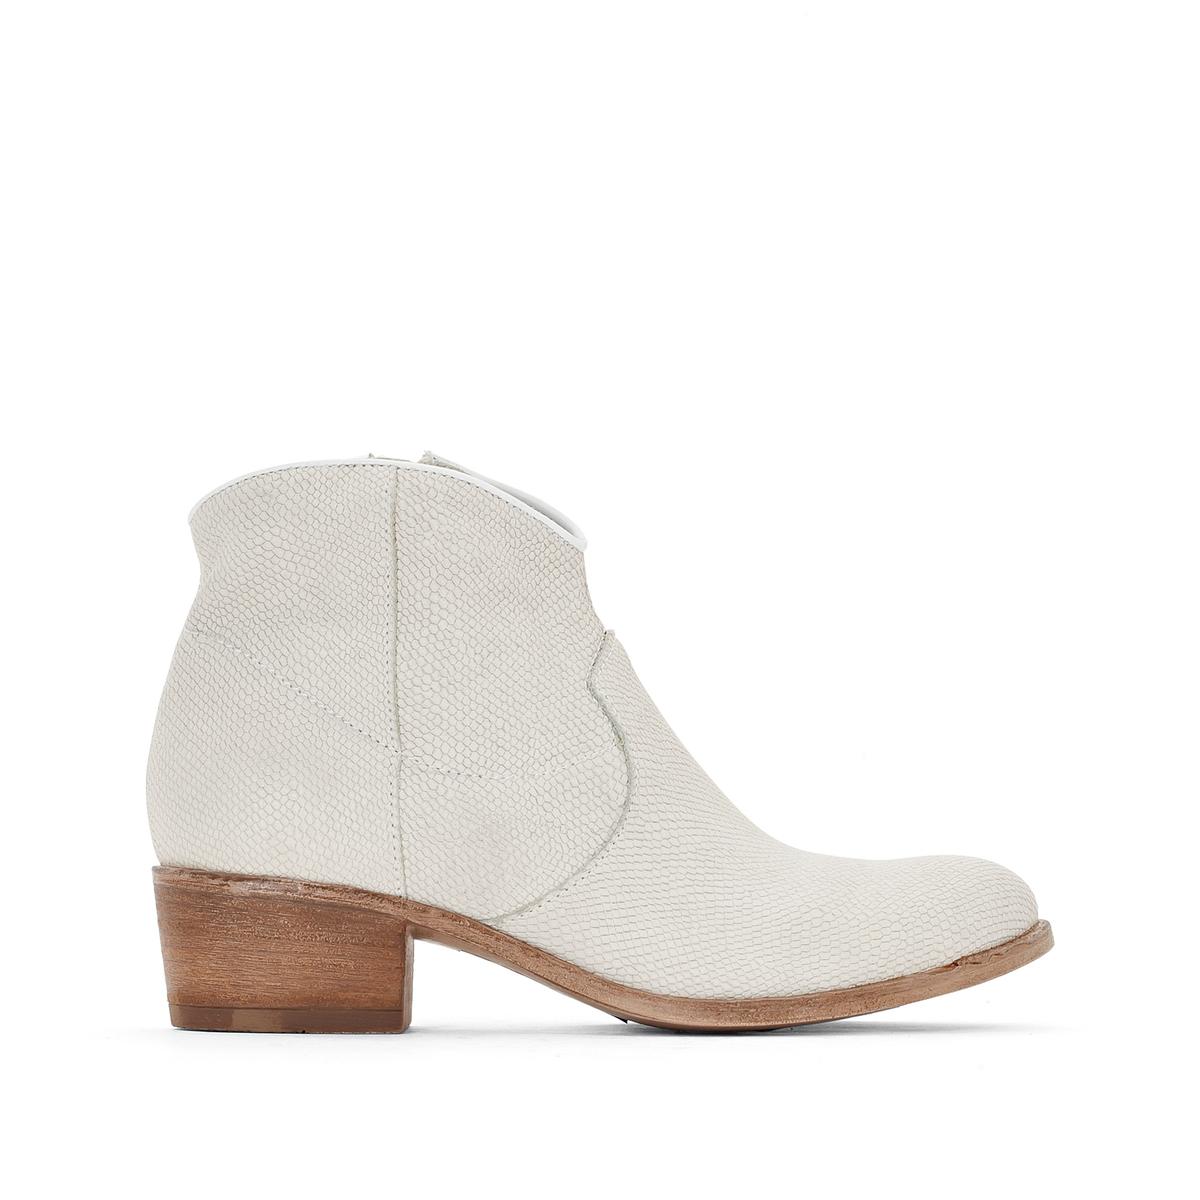 Ботильоны кожаные Donella на каблуке цены онлайн